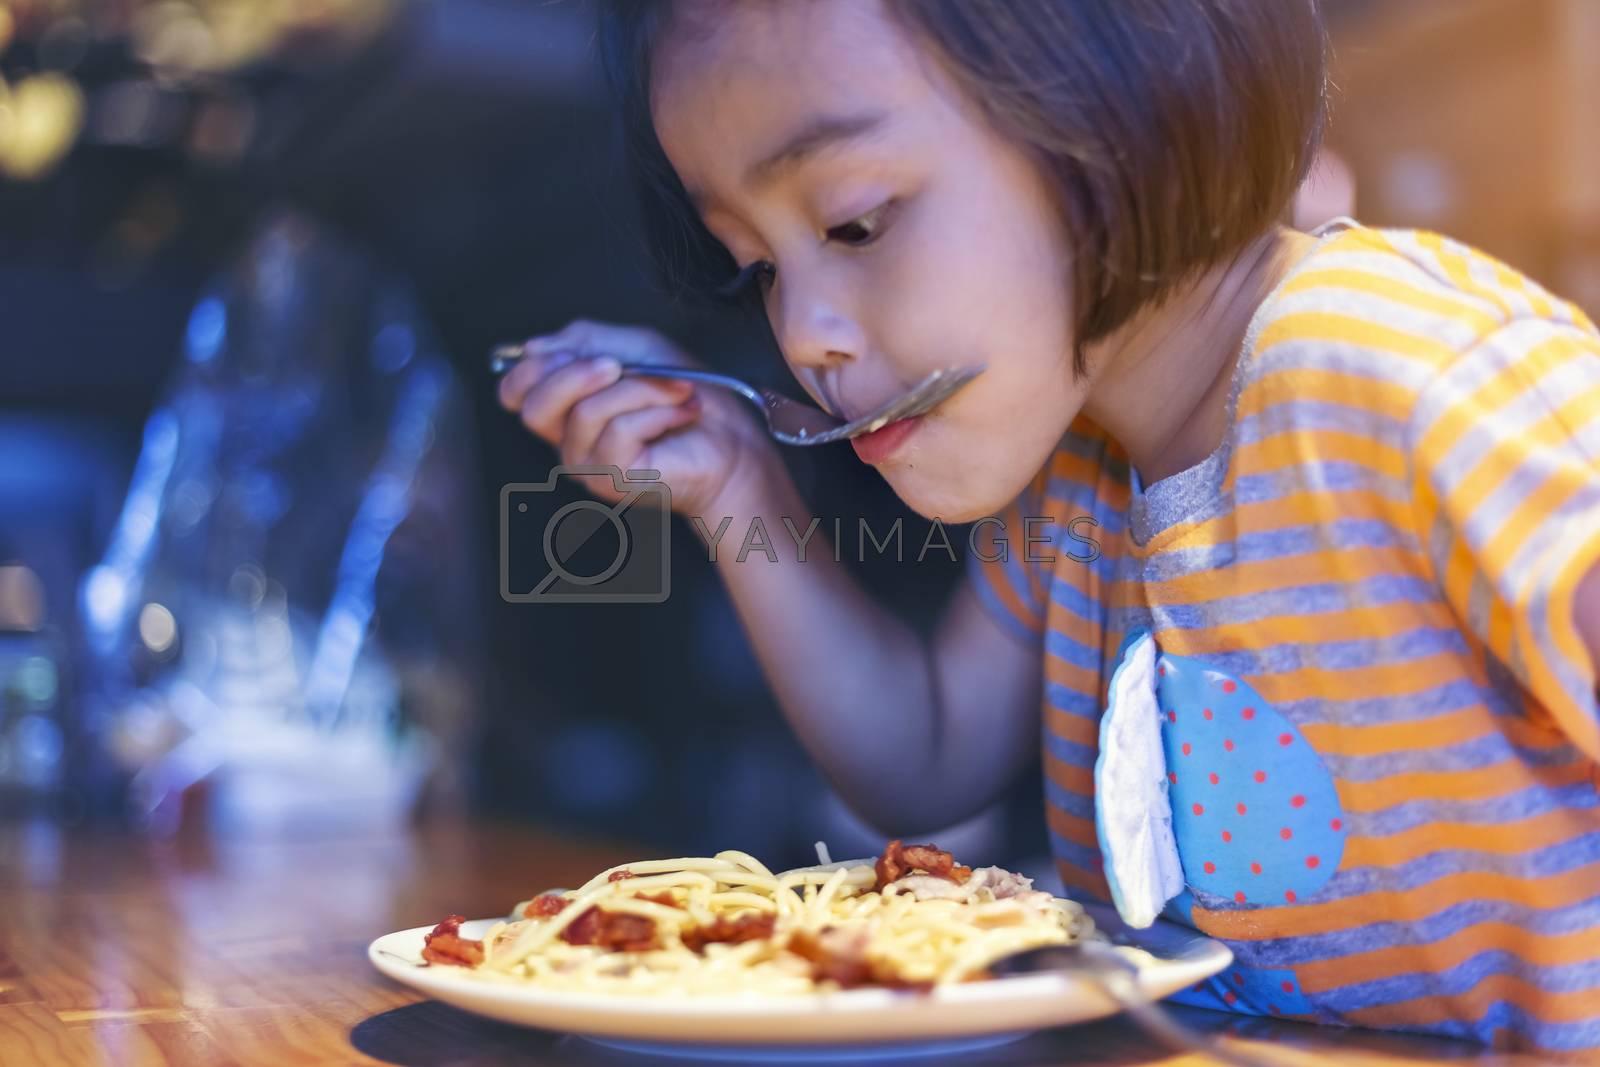 Asian little girl is eating spaghetti bolognese in the restaurant happily.